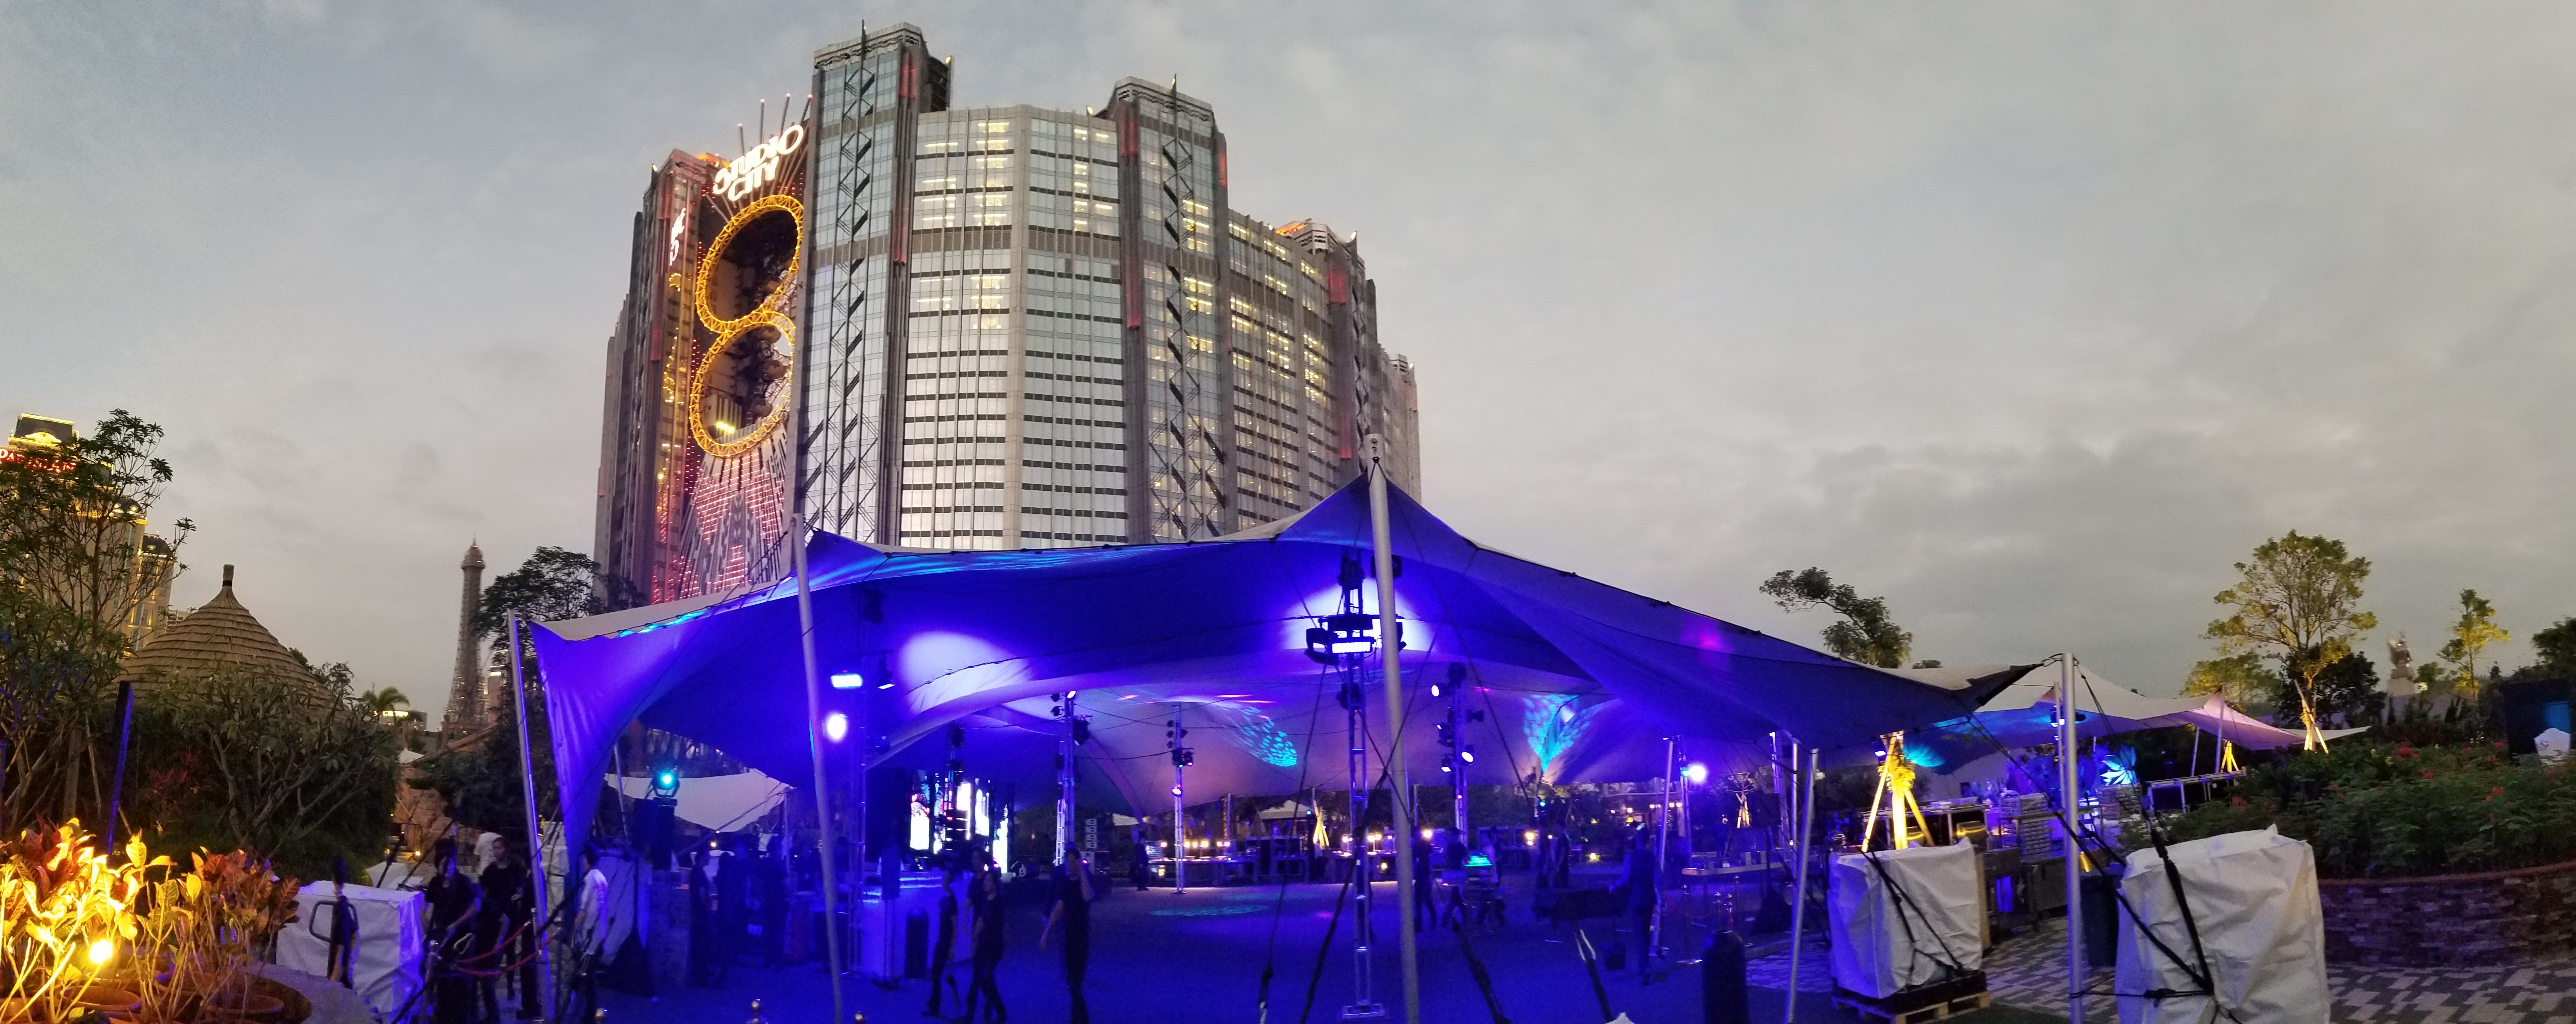 Macau_Studio City_Gala Garden_Pacha